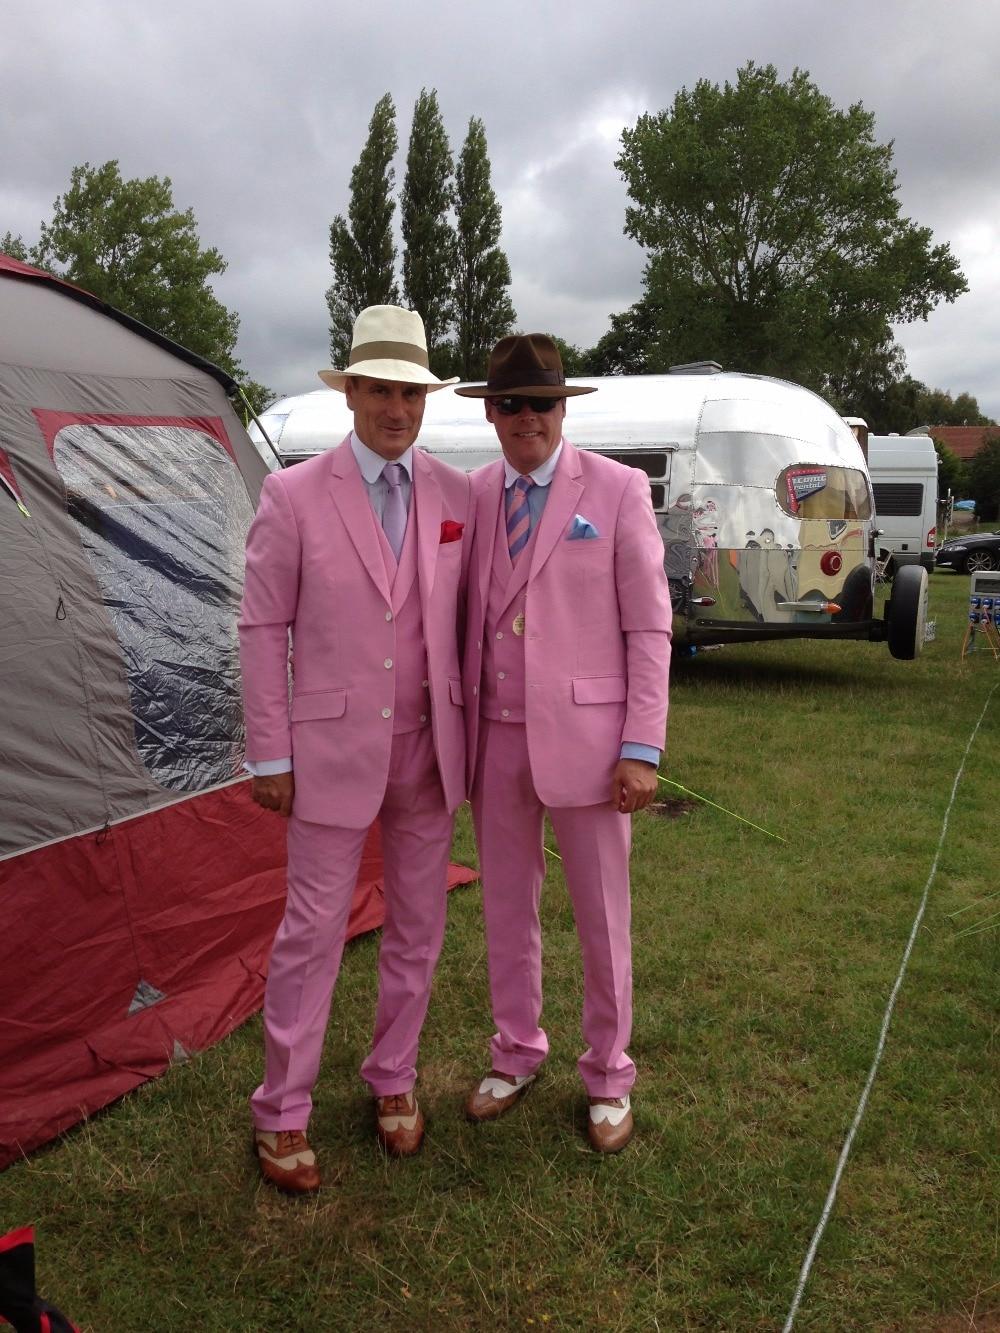 2017 Latest Coat Pant Designs Hot Pink Men Suit Groom Jacket Slim Fit 3 Piece Tuxedo Style Suits Custom Prom Blazer Masculino C5